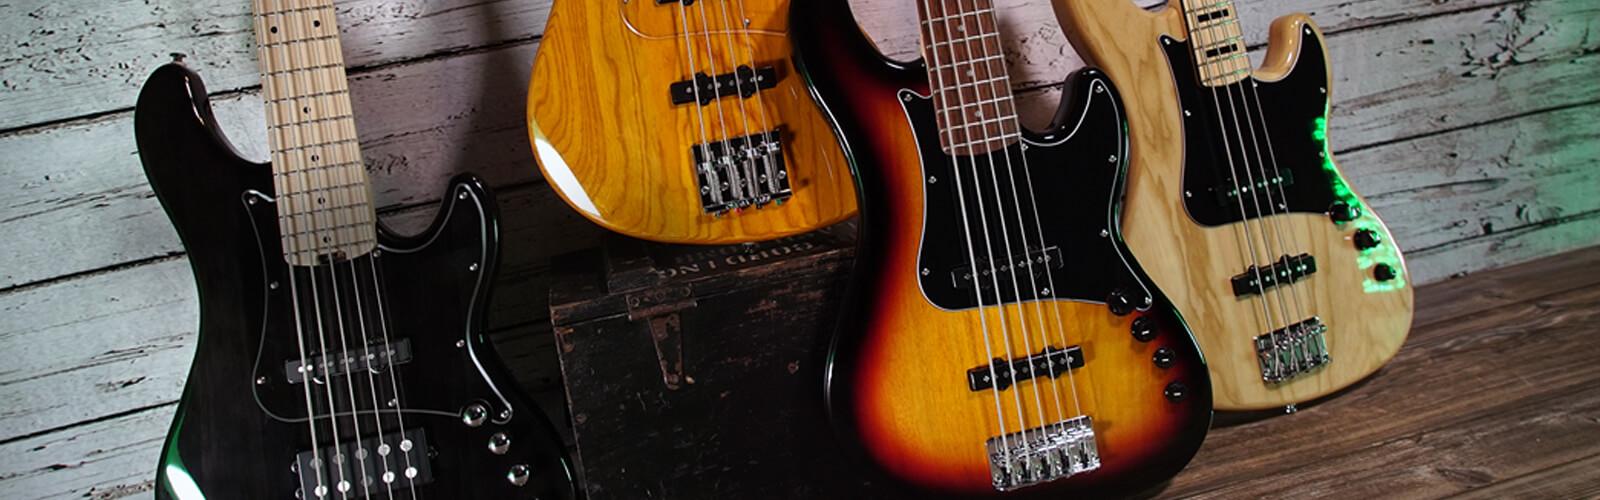 bass guitars lifestyle image